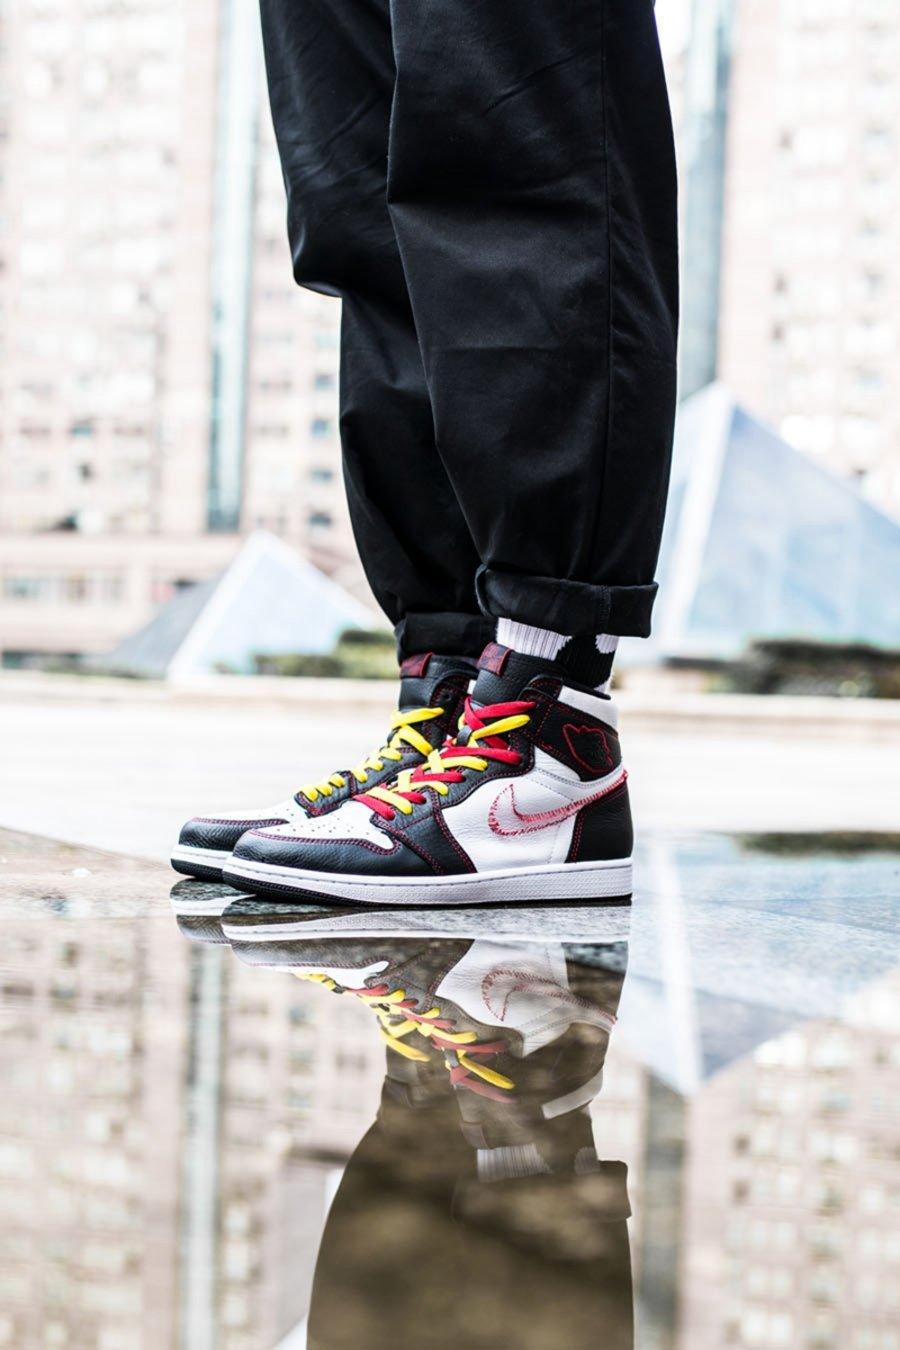 Air Jordan 1,AJ1 这十双当下「最值得买的 AJ1」里,还真有好看好搭的性价比之选!